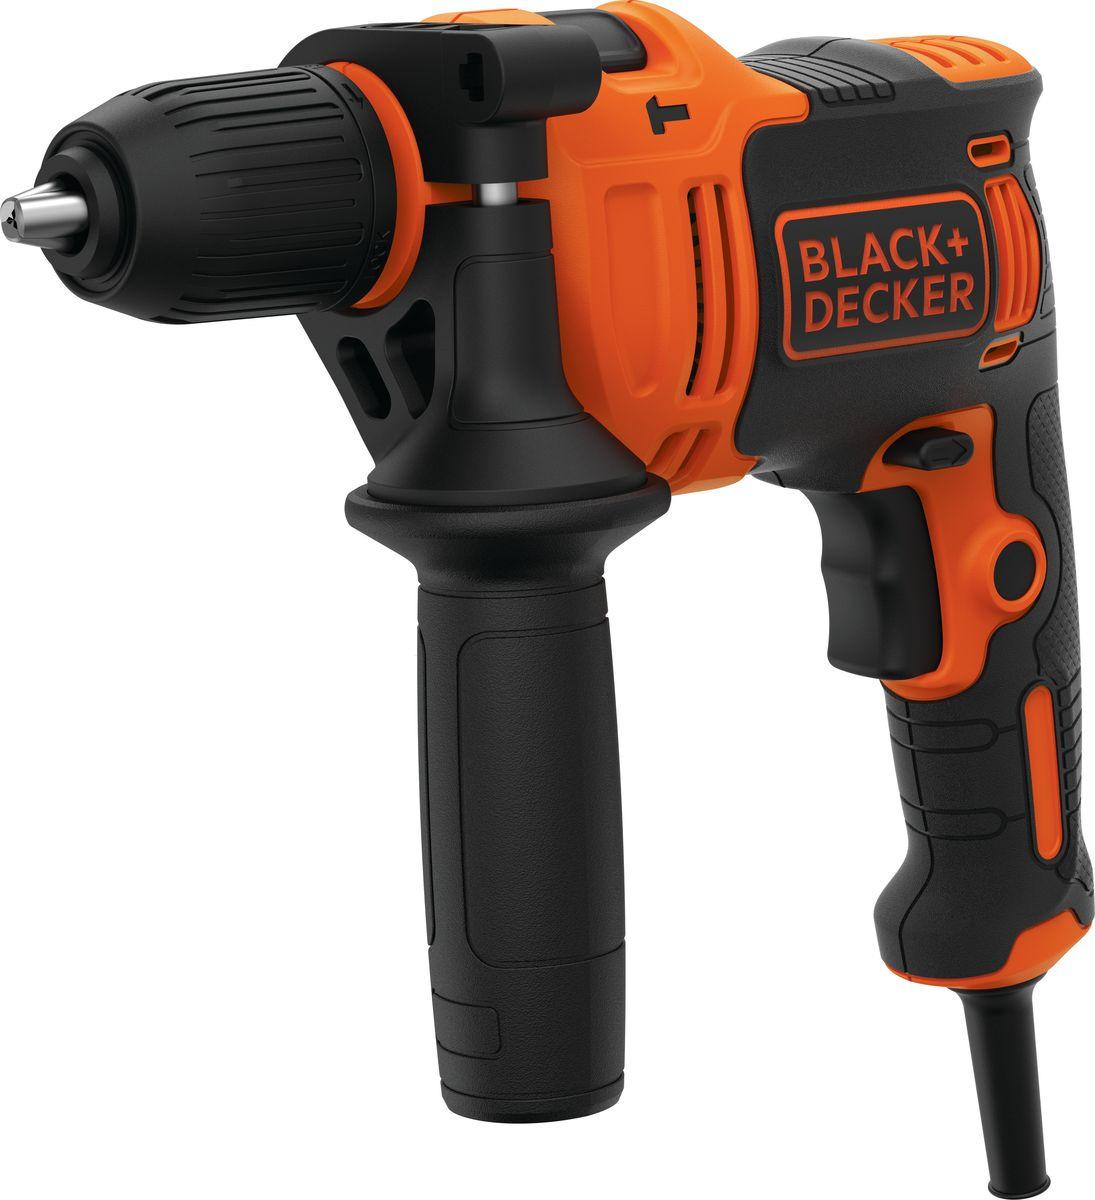 Дрель Black & Decker Omega BEH710, электронная, ударная, оранжевый, черный